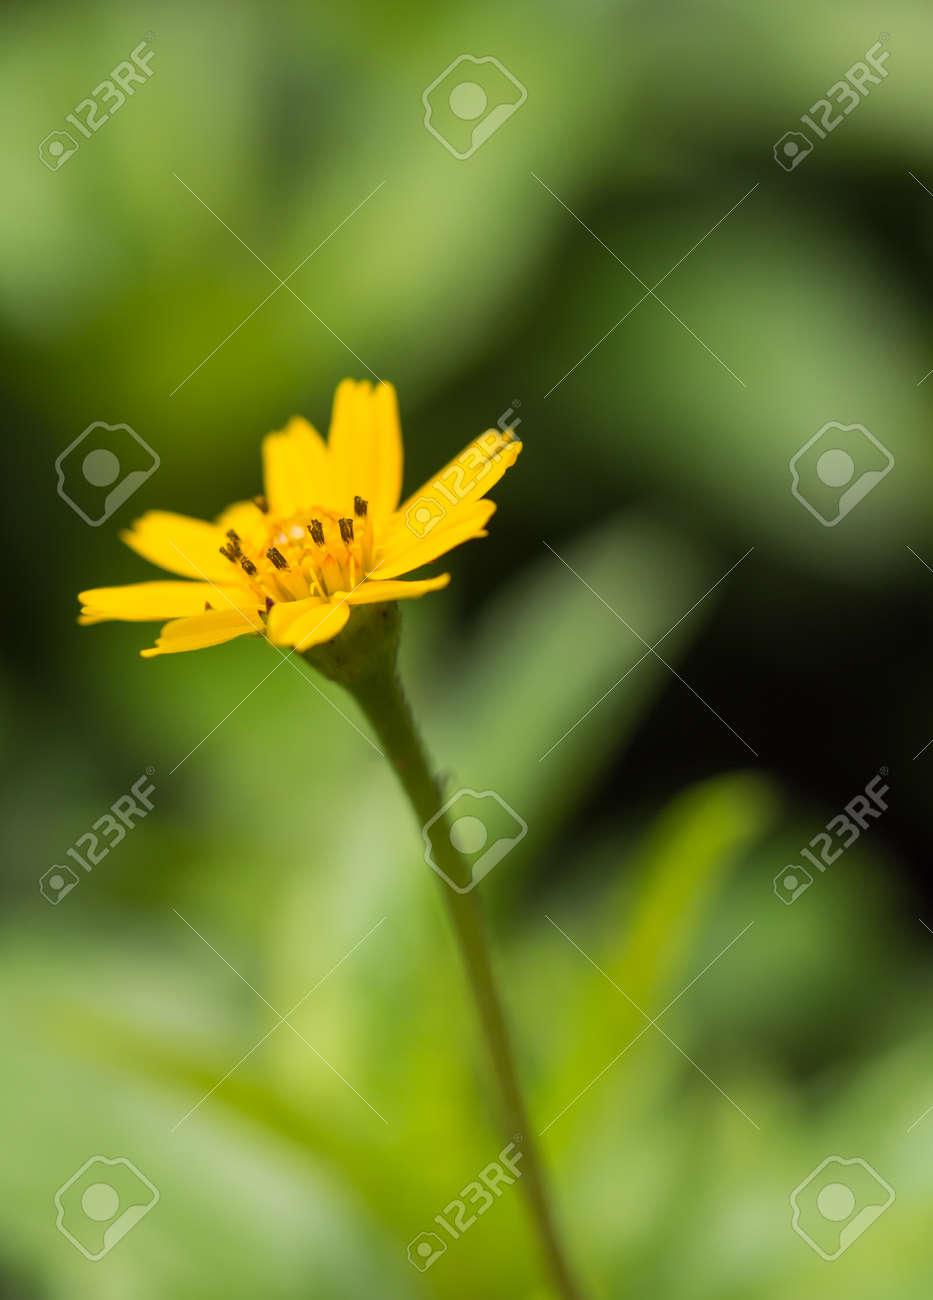 Beautiful Single Flower Of Little Yellow Star Melampodium